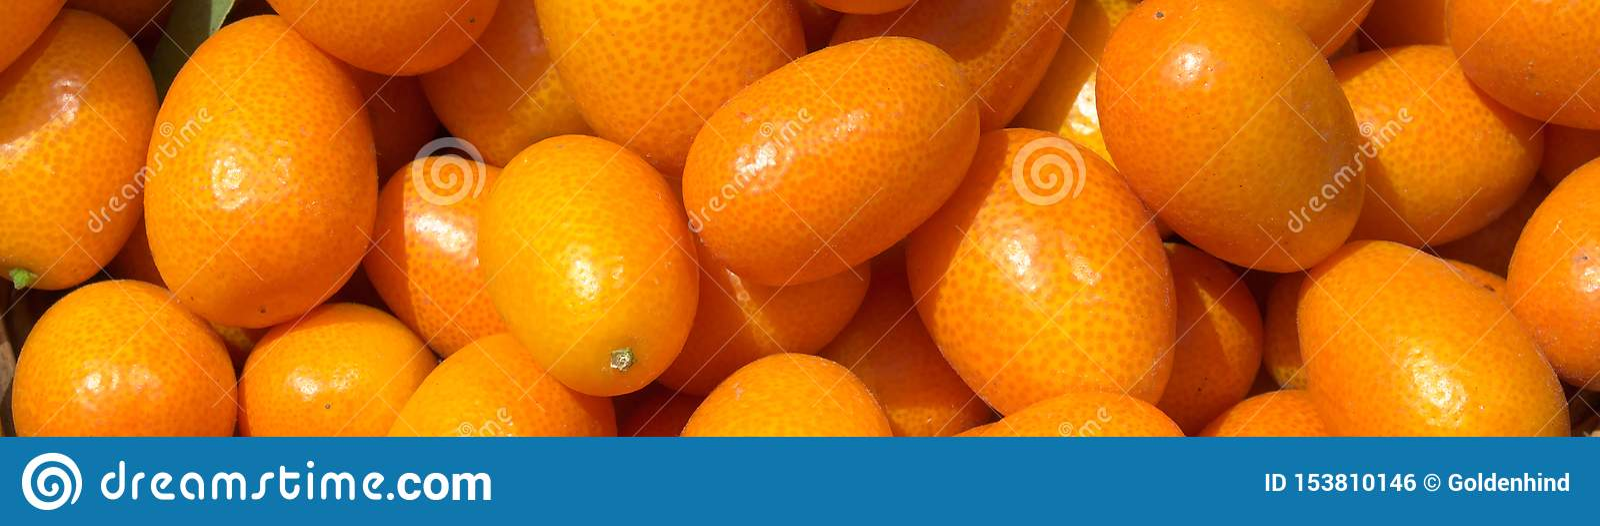 Kumquat succosi freschi in un canestro nel mercato Fondo arancio delle arance fresche closeup